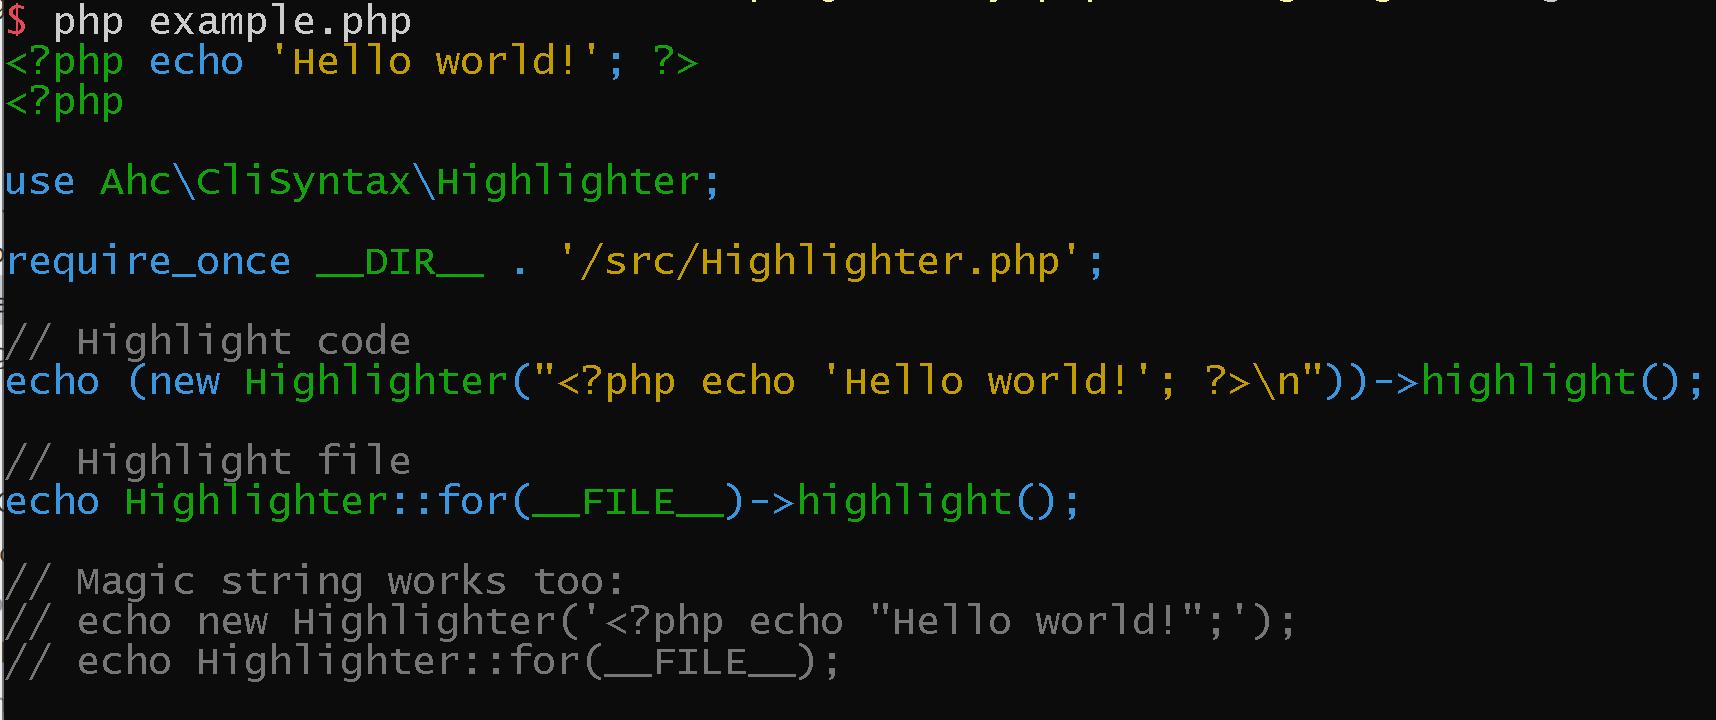 adhocore/cli-syntax